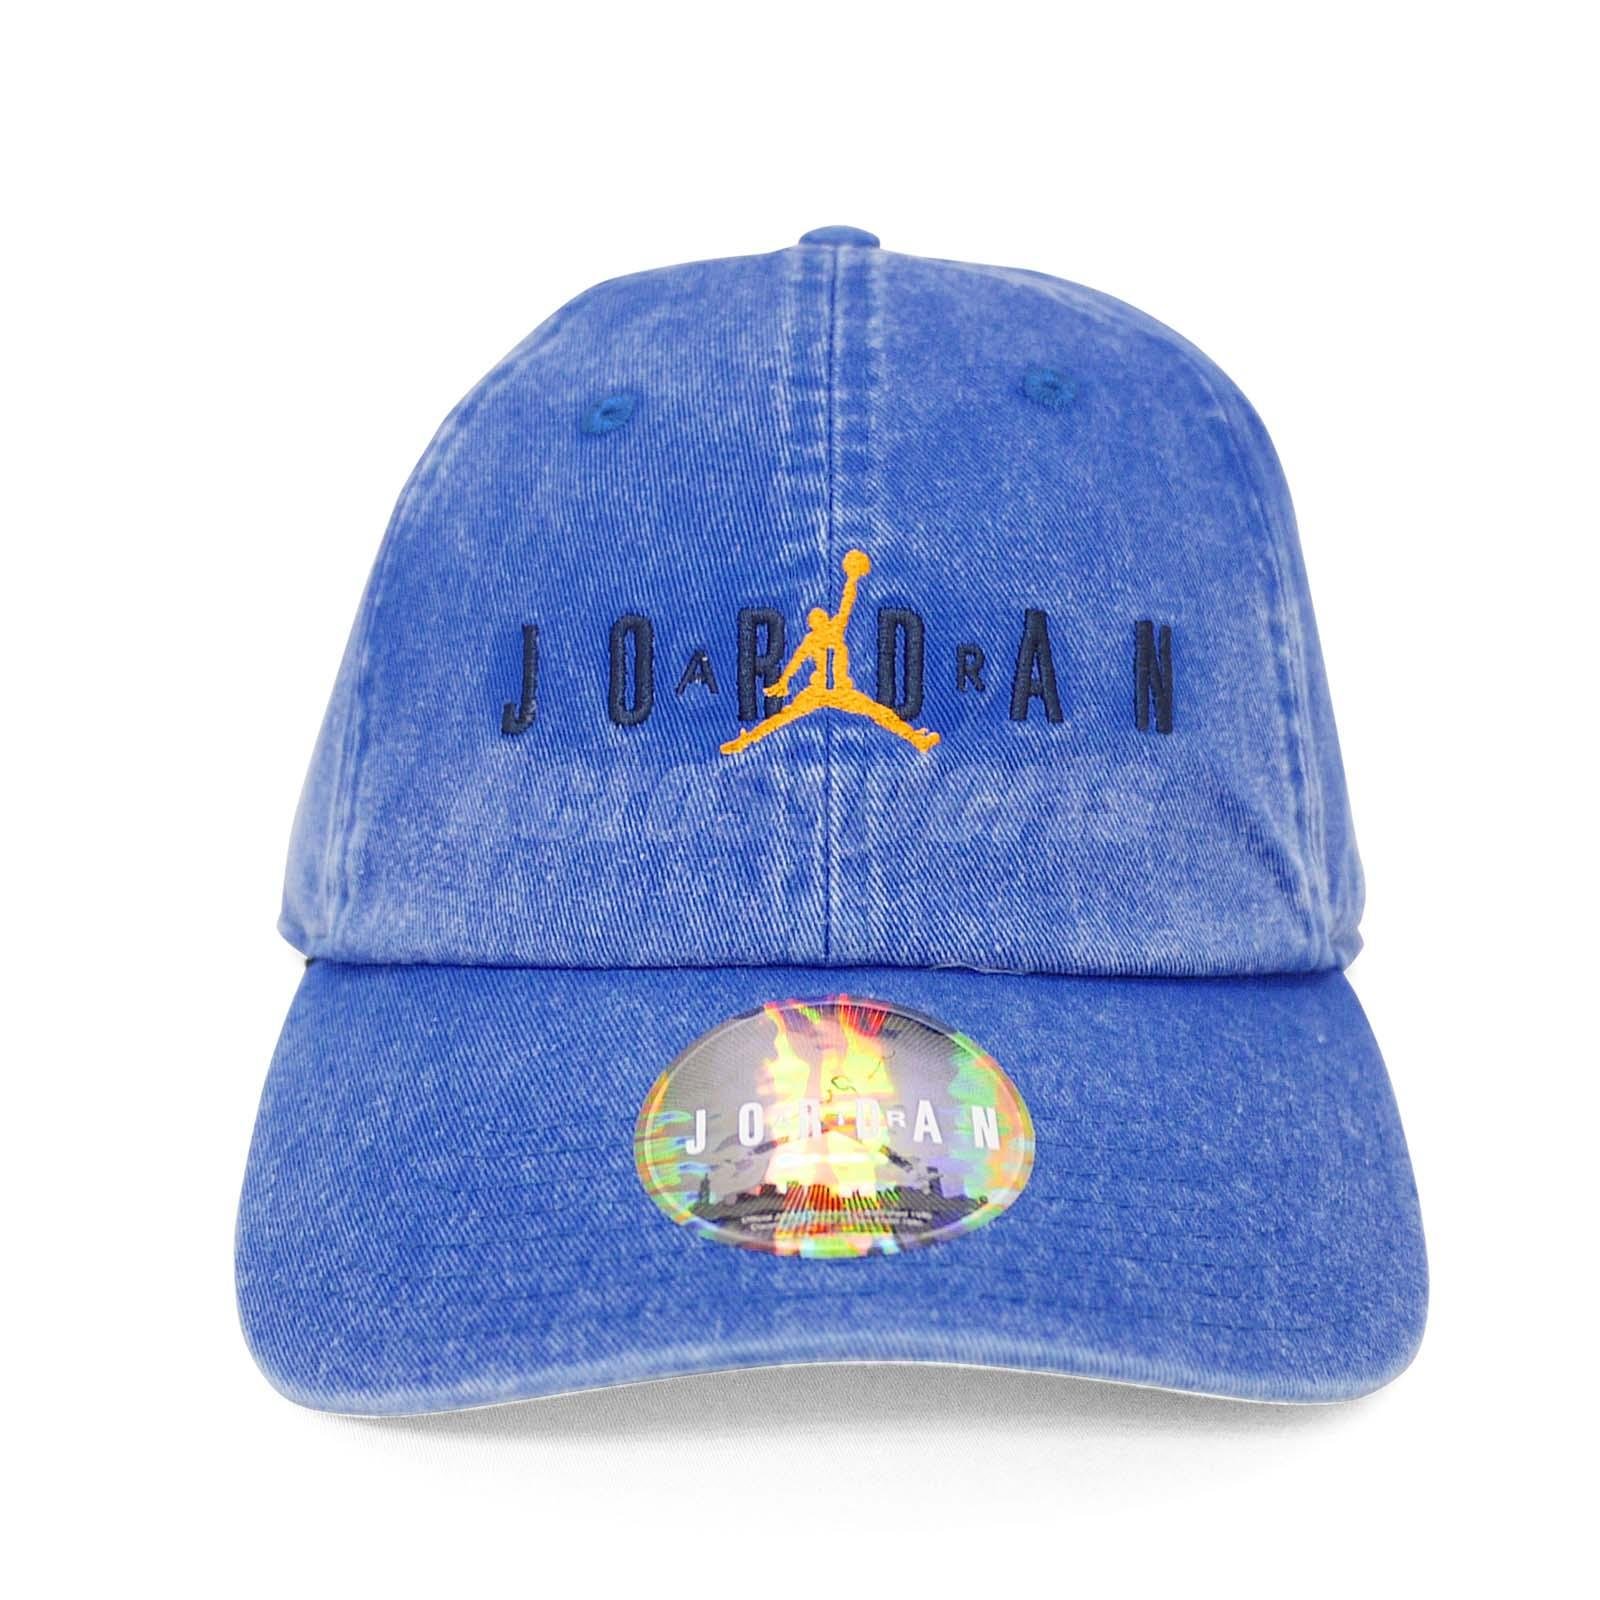 c48d4c4385db Nike Jordan Heritage Jumpman Adjustable Cap Air Hat H86 Washed Blue ...